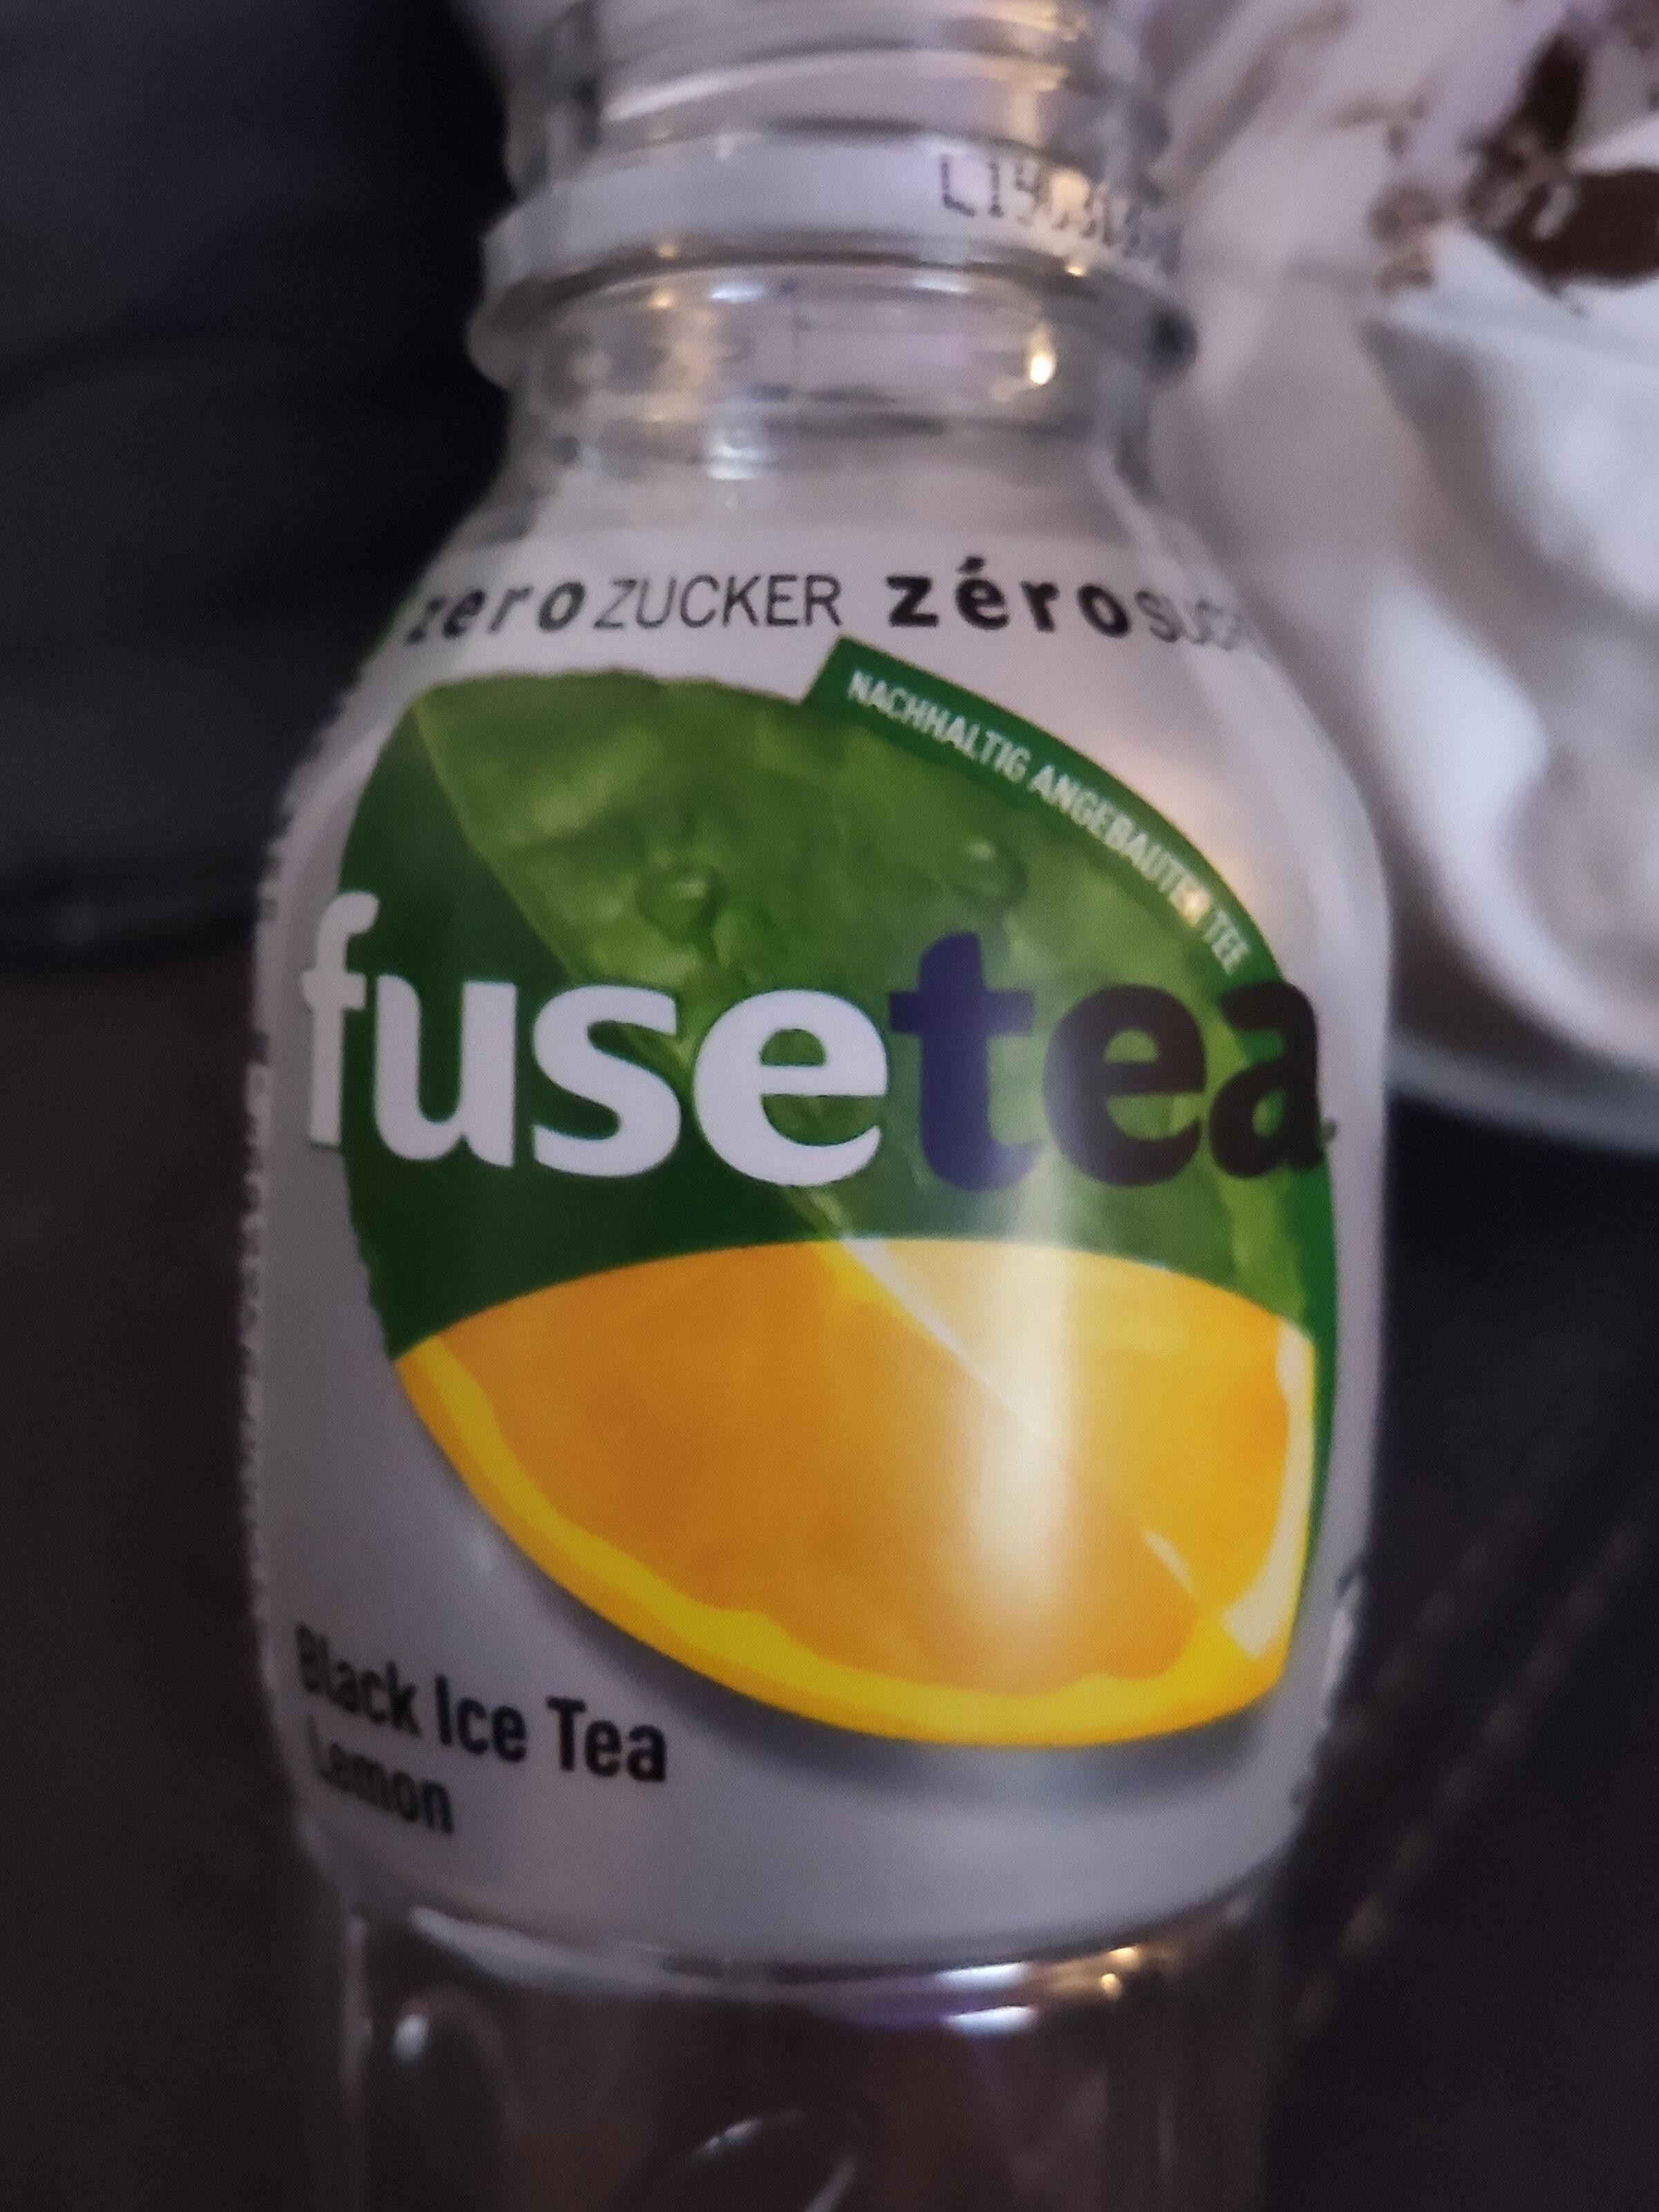 Fuse Tea Zero Citron - Product - fr